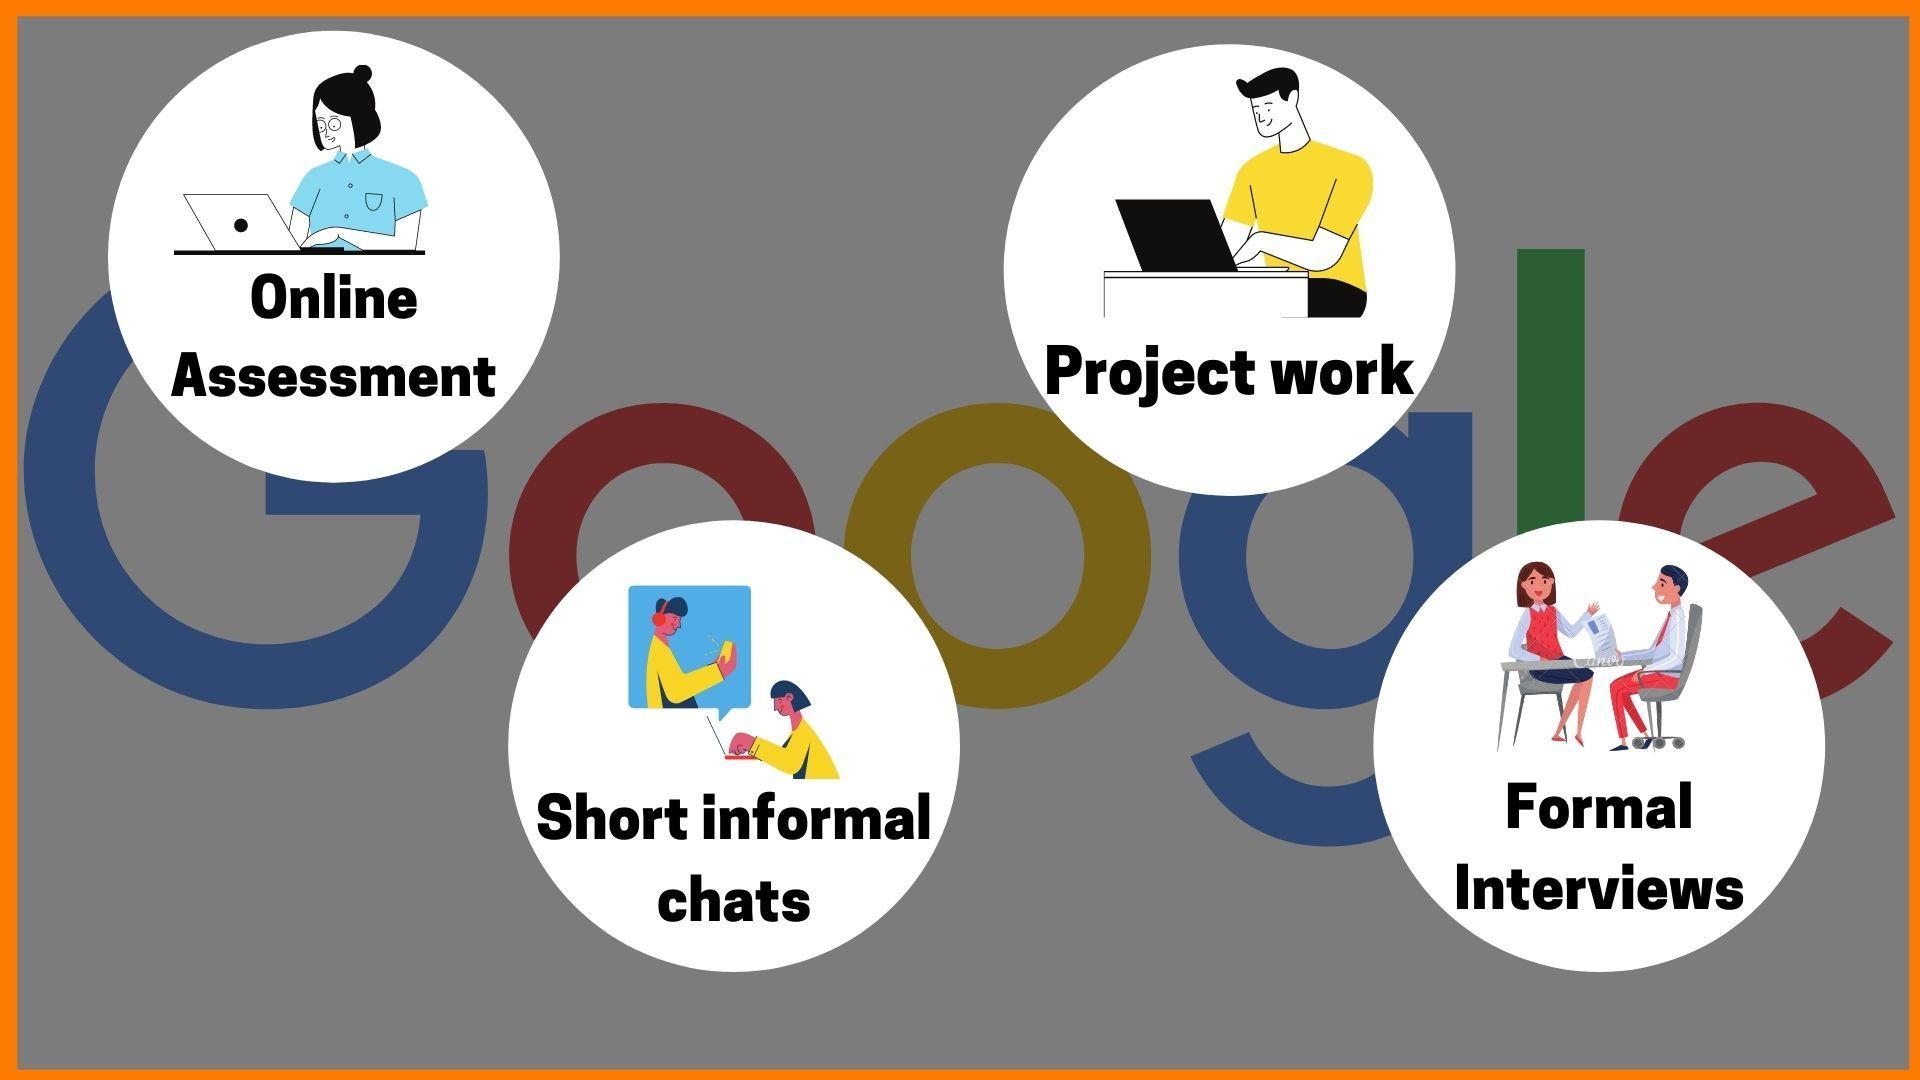 Google's Hiring Process